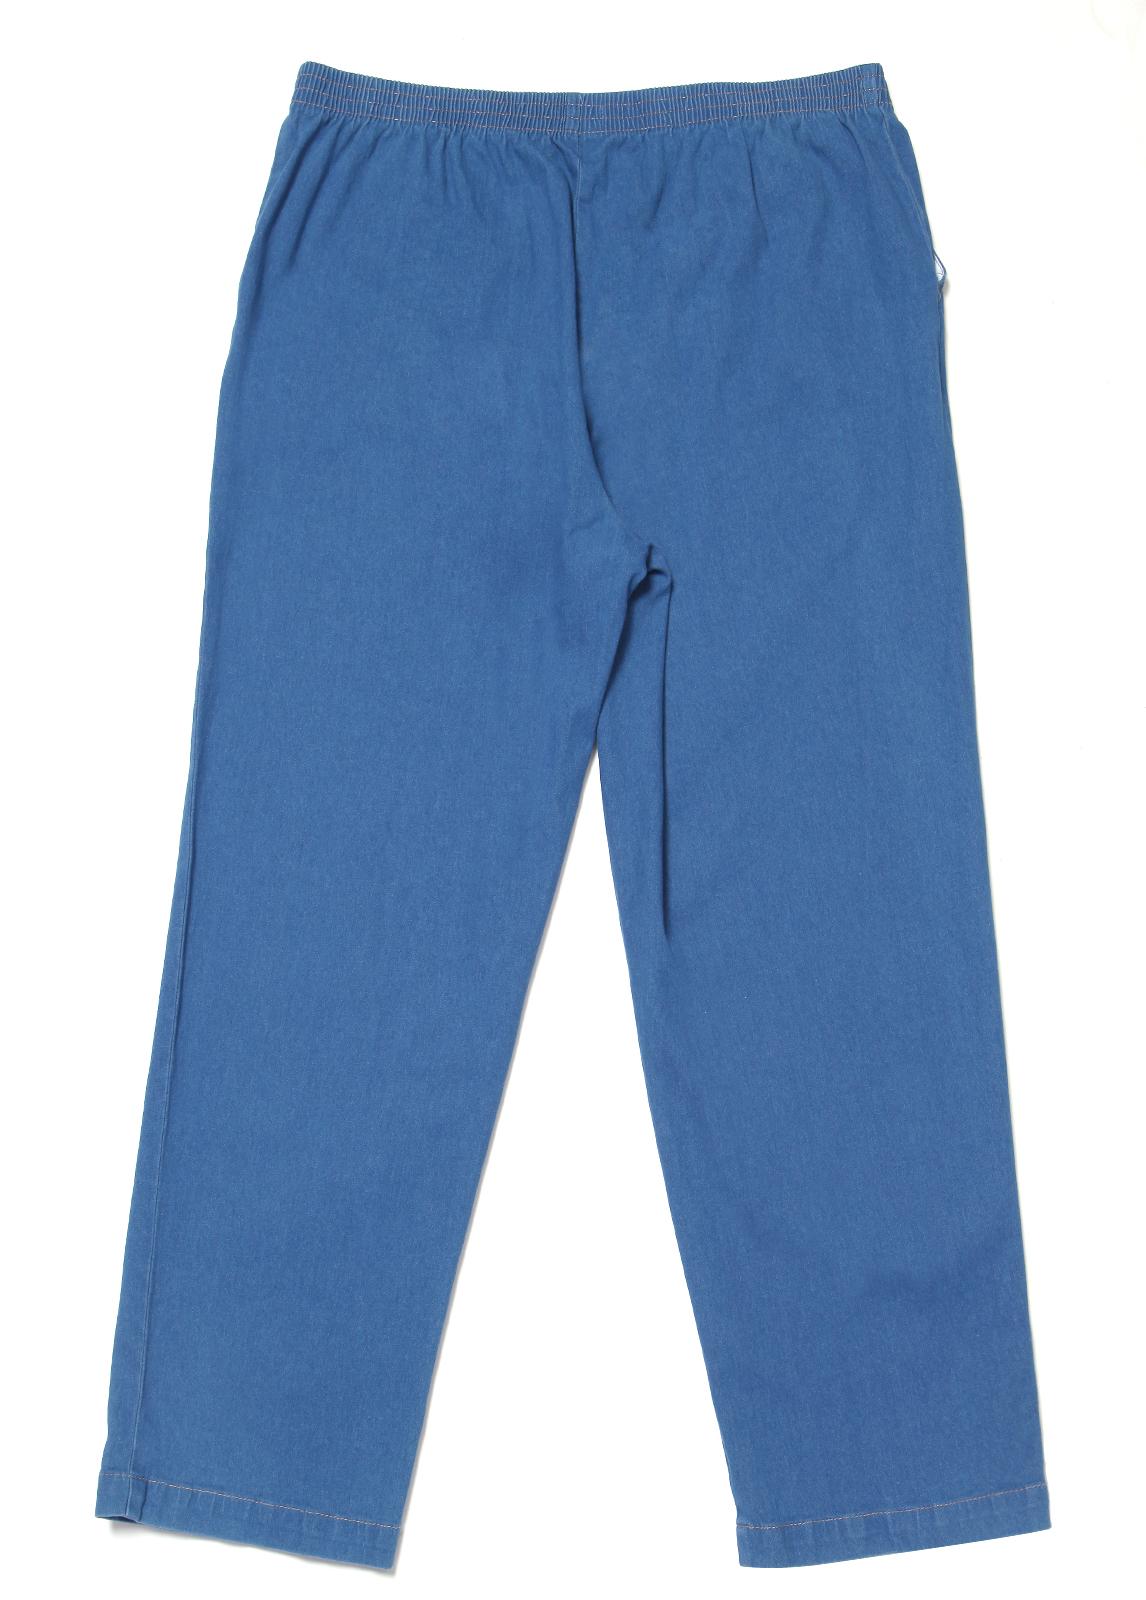 Wonderful Womens Casual Denim Jeans Pants Straight Leg Pull On Elastic High